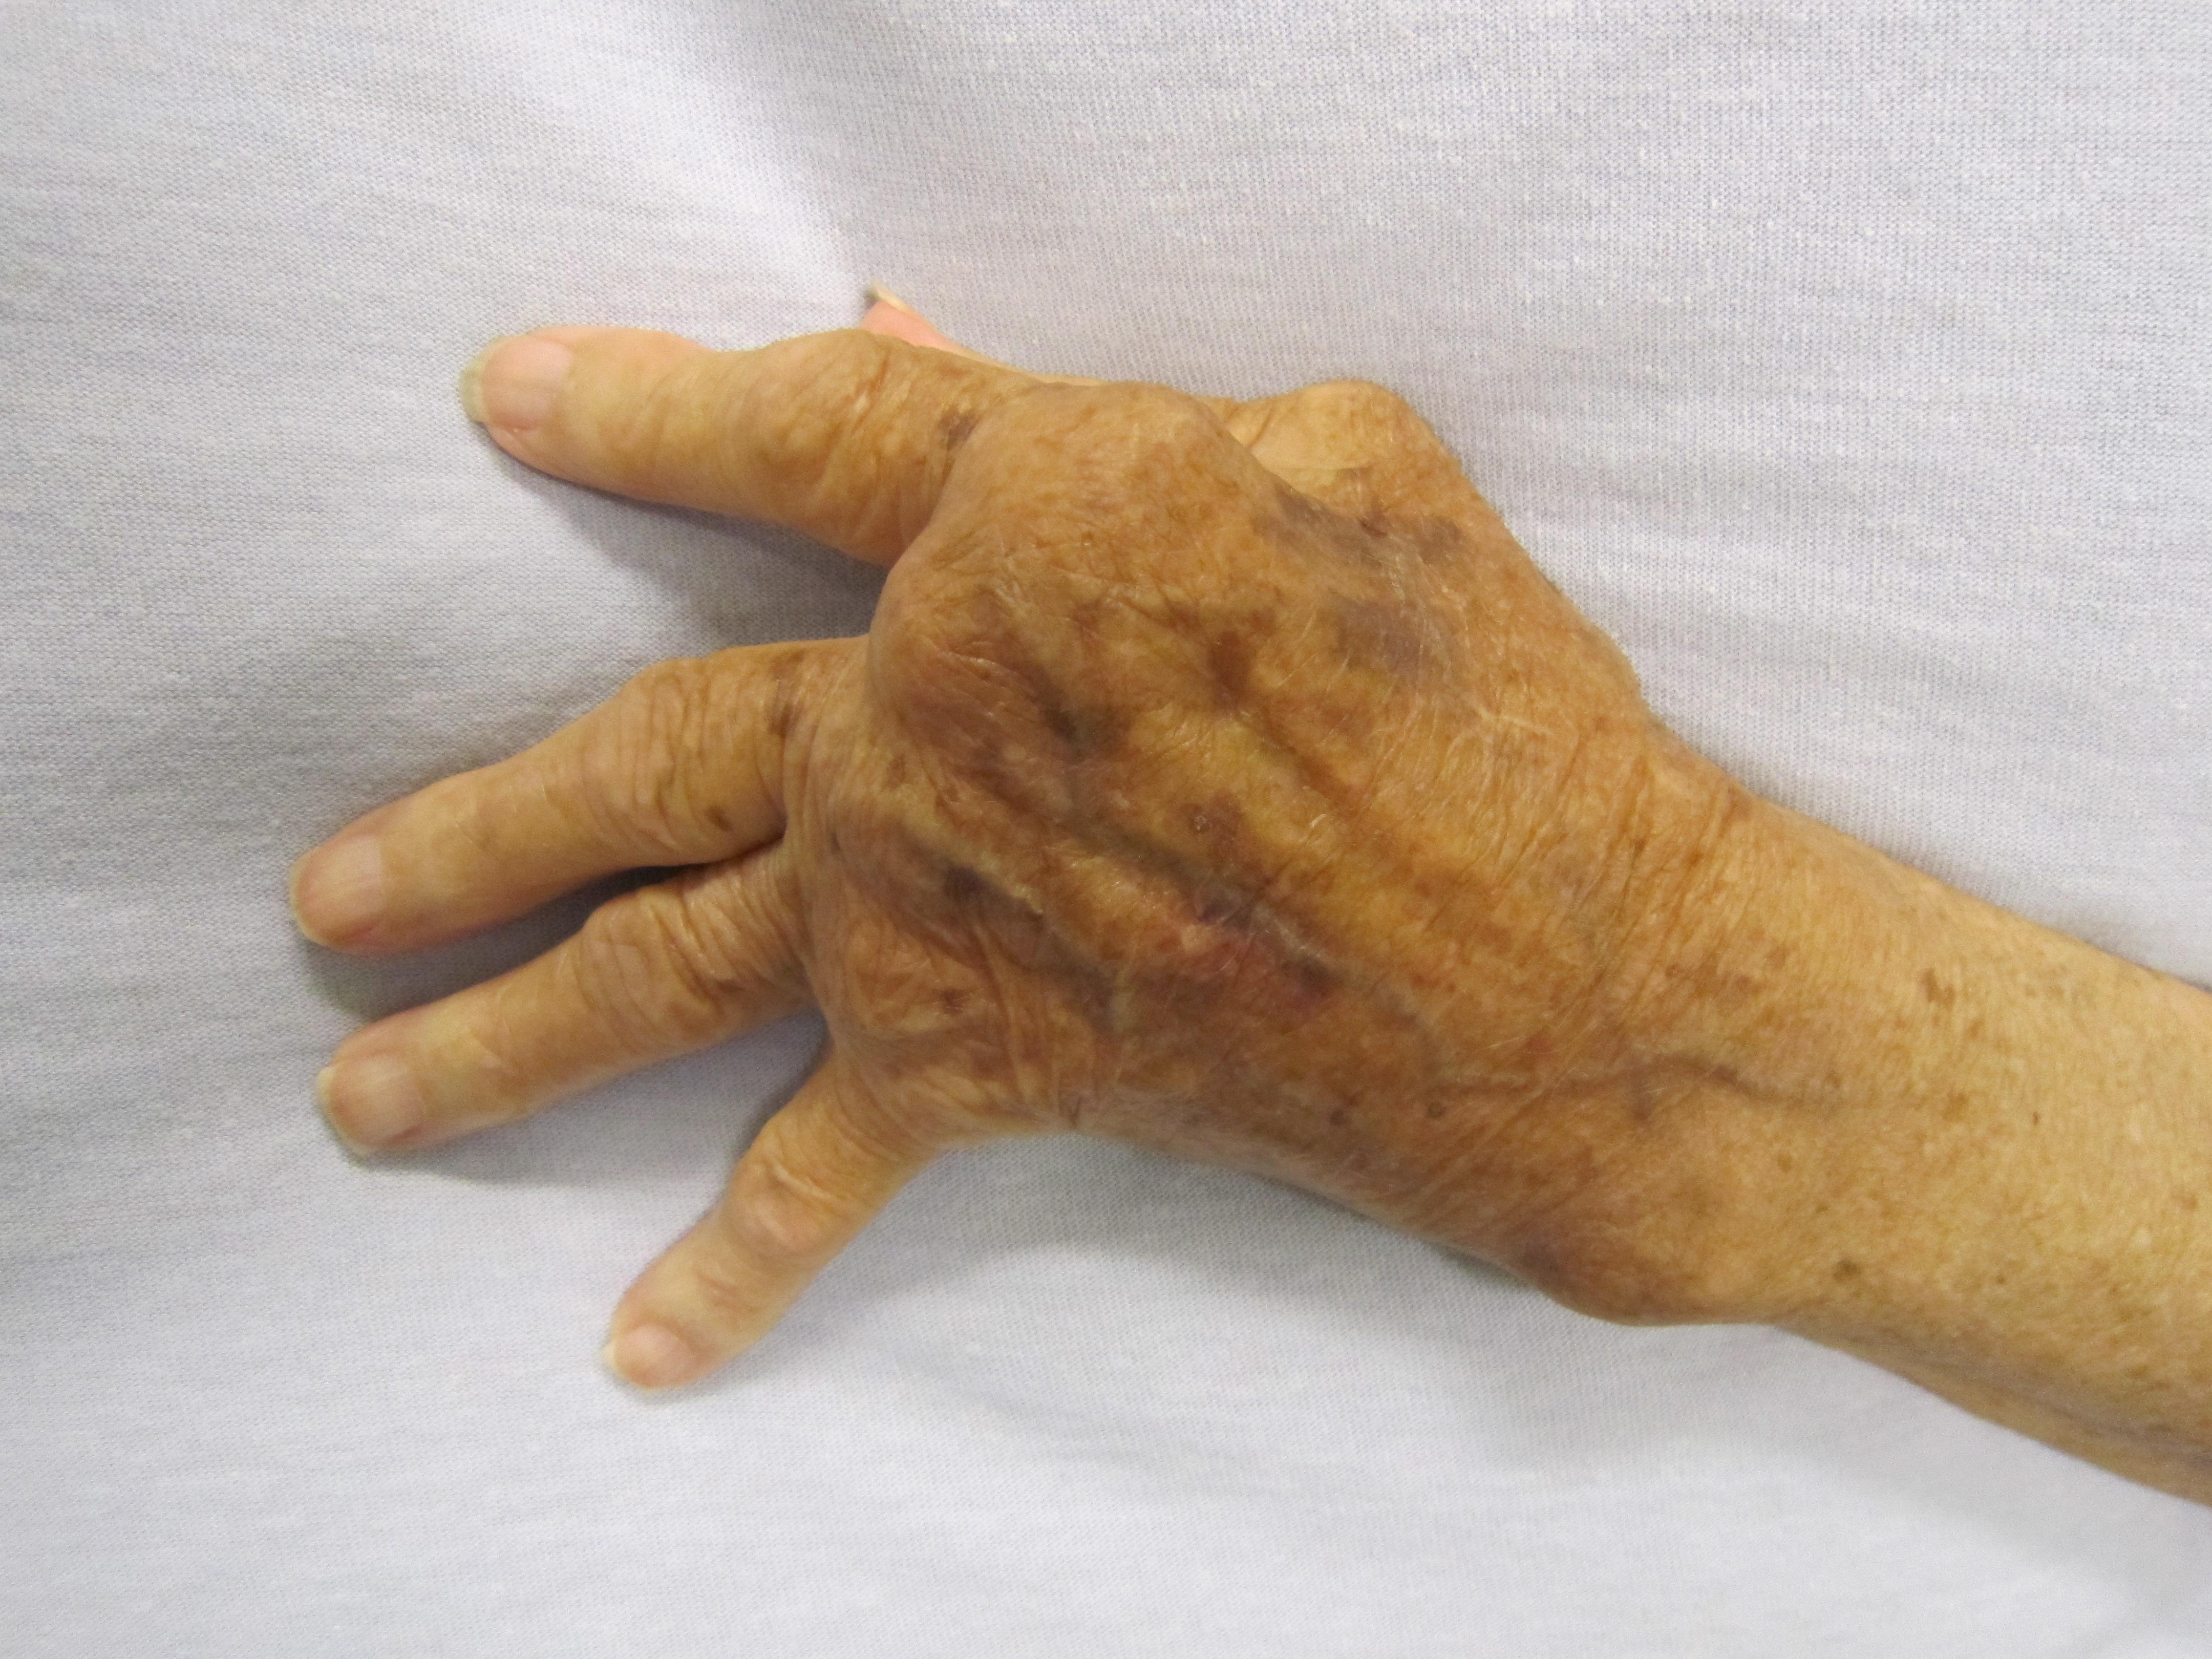 ízületi betegség radiológiai tünetei)